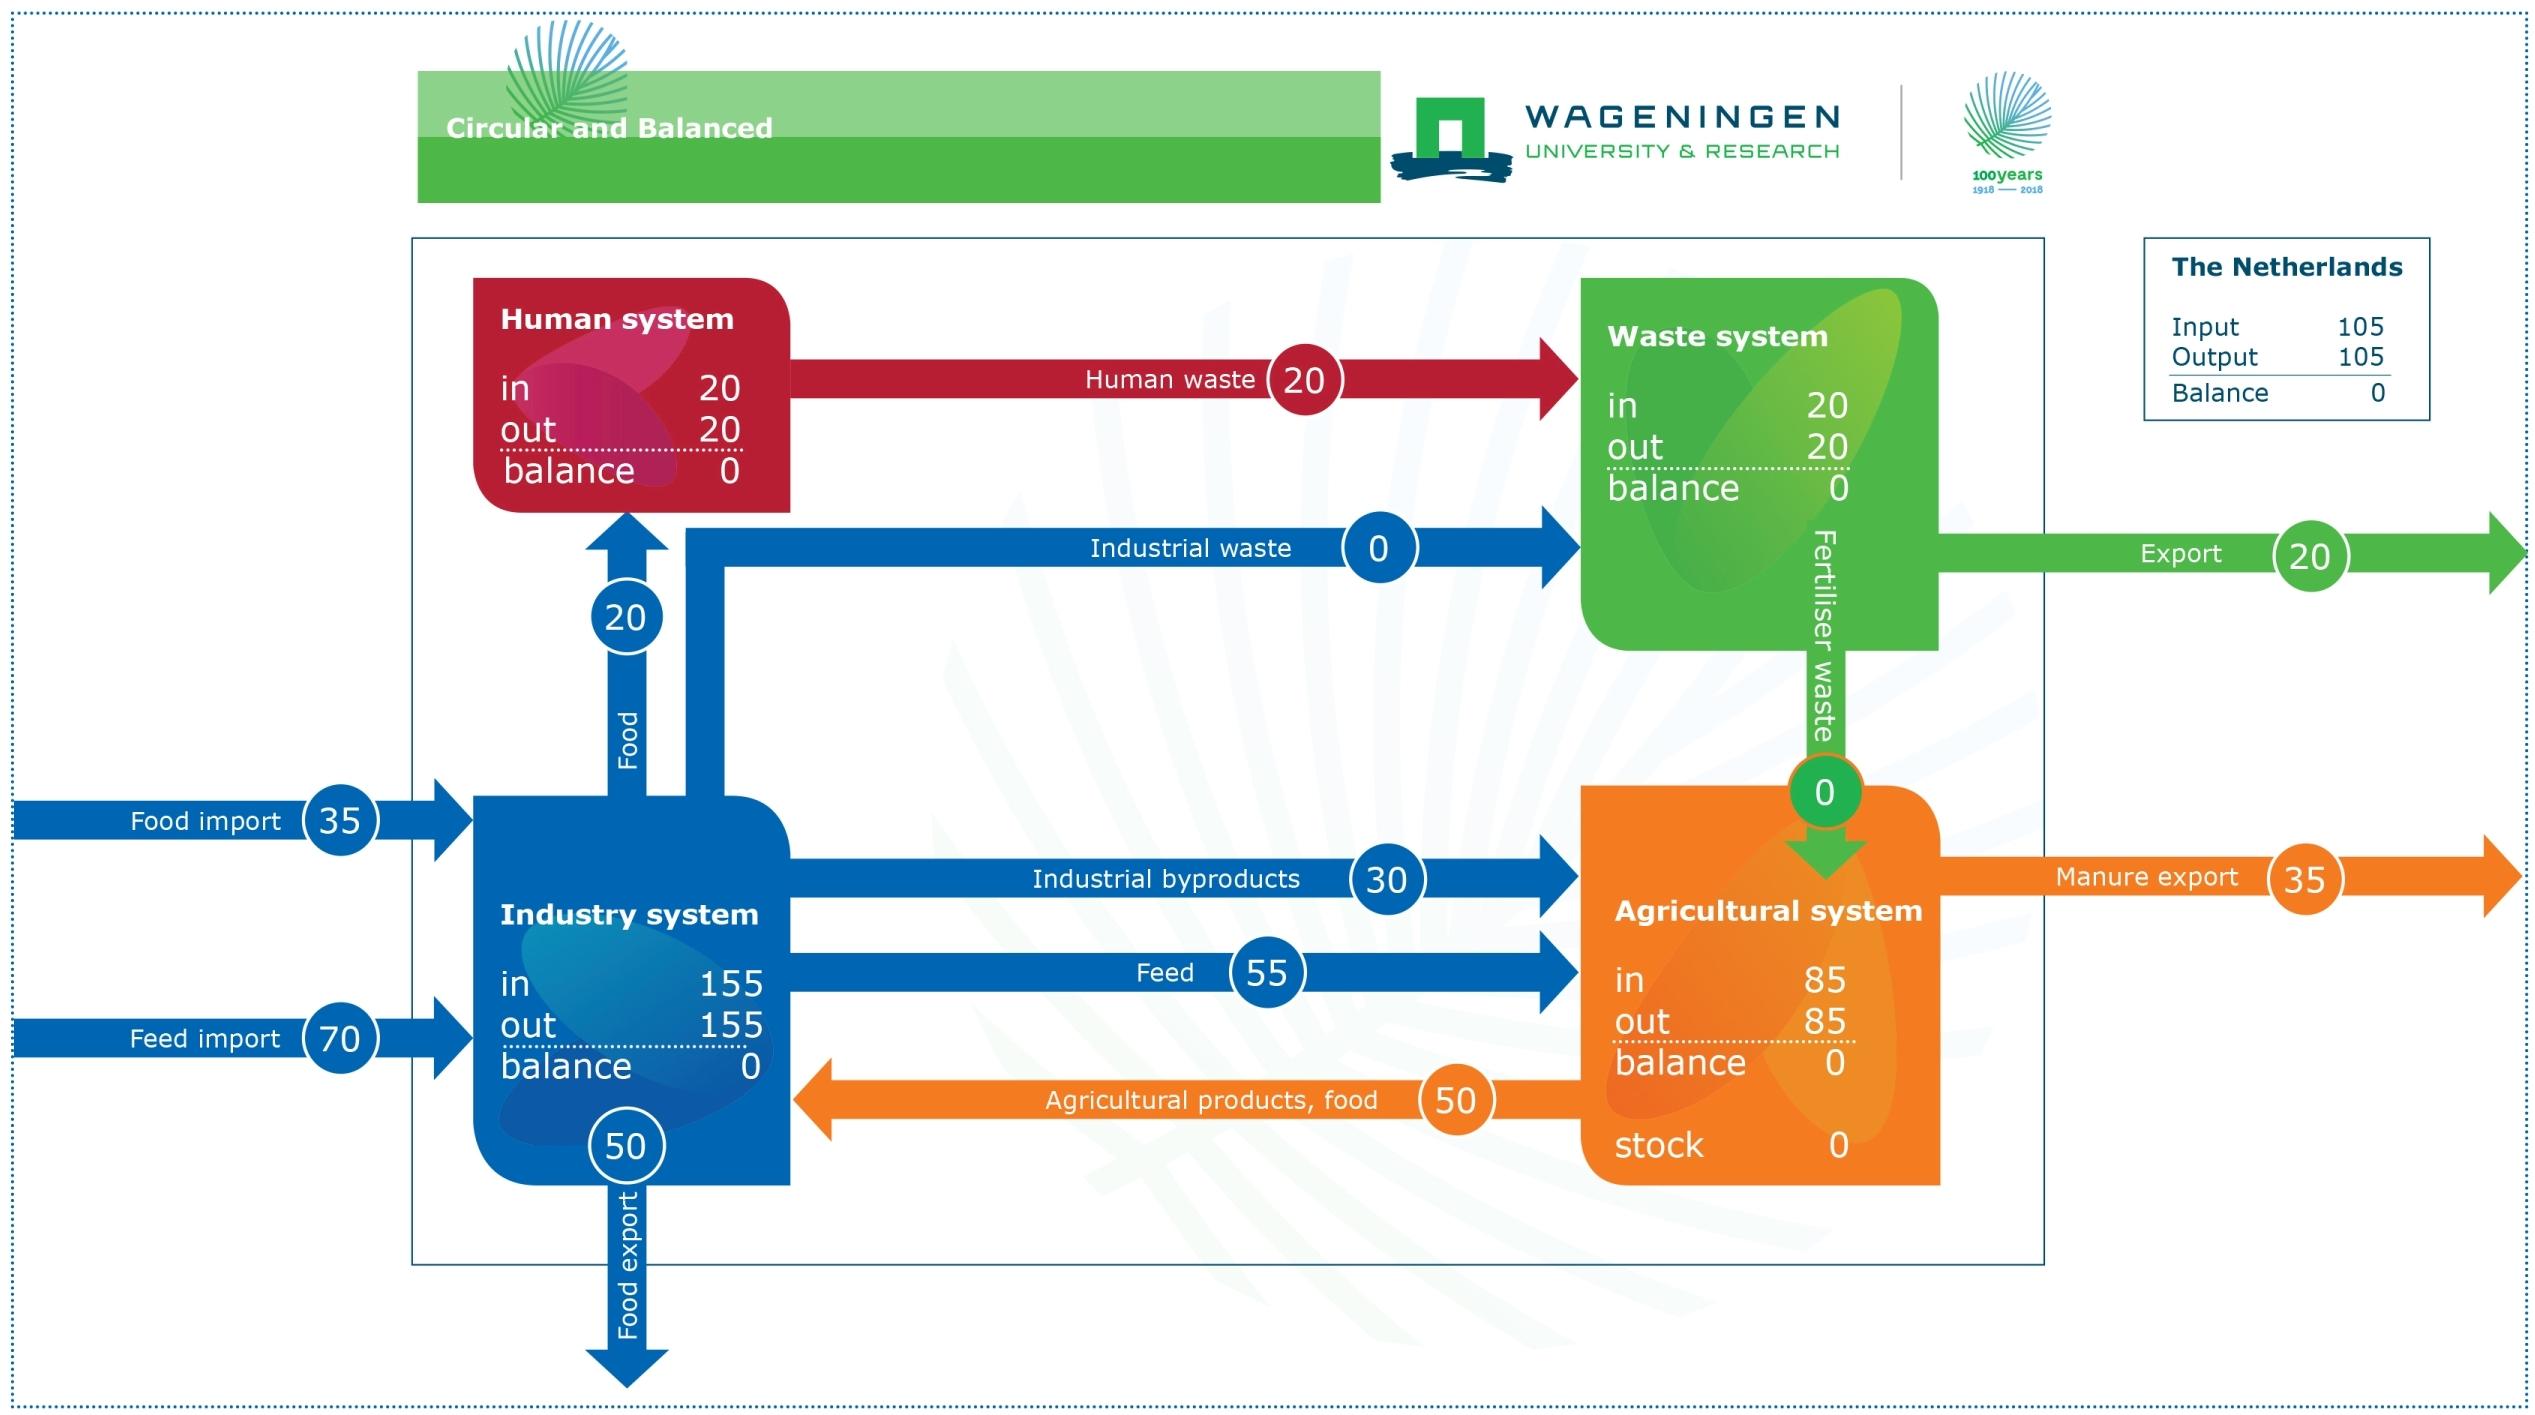 Fosforbalans - circulair en gebalanceerd